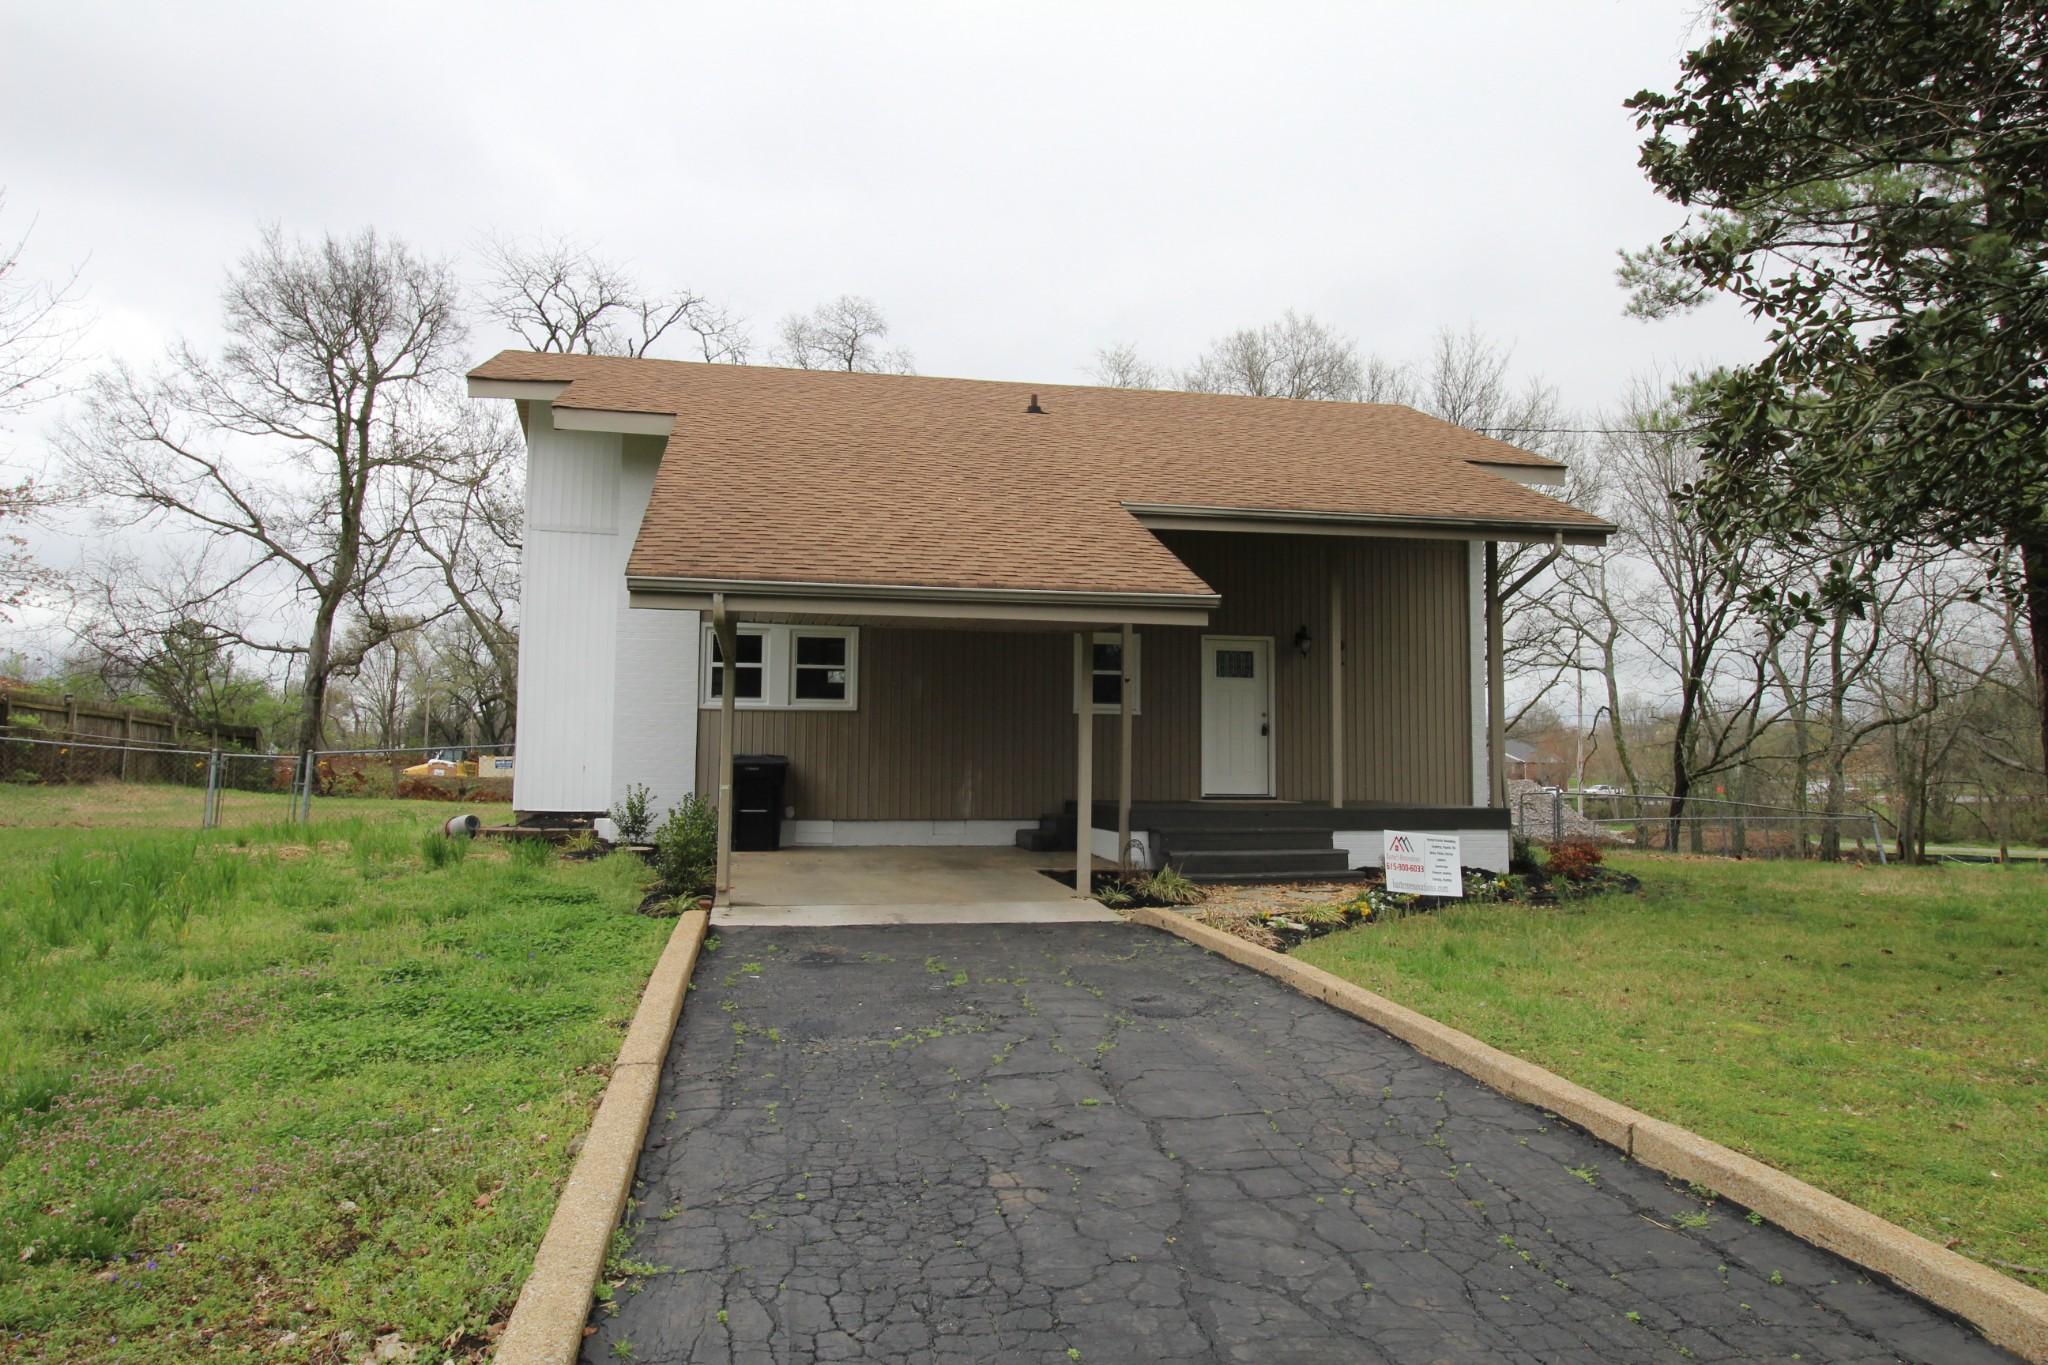 614 Elliott Dr, Murfreesboro, TN 37129 - Murfreesboro, TN real estate listing